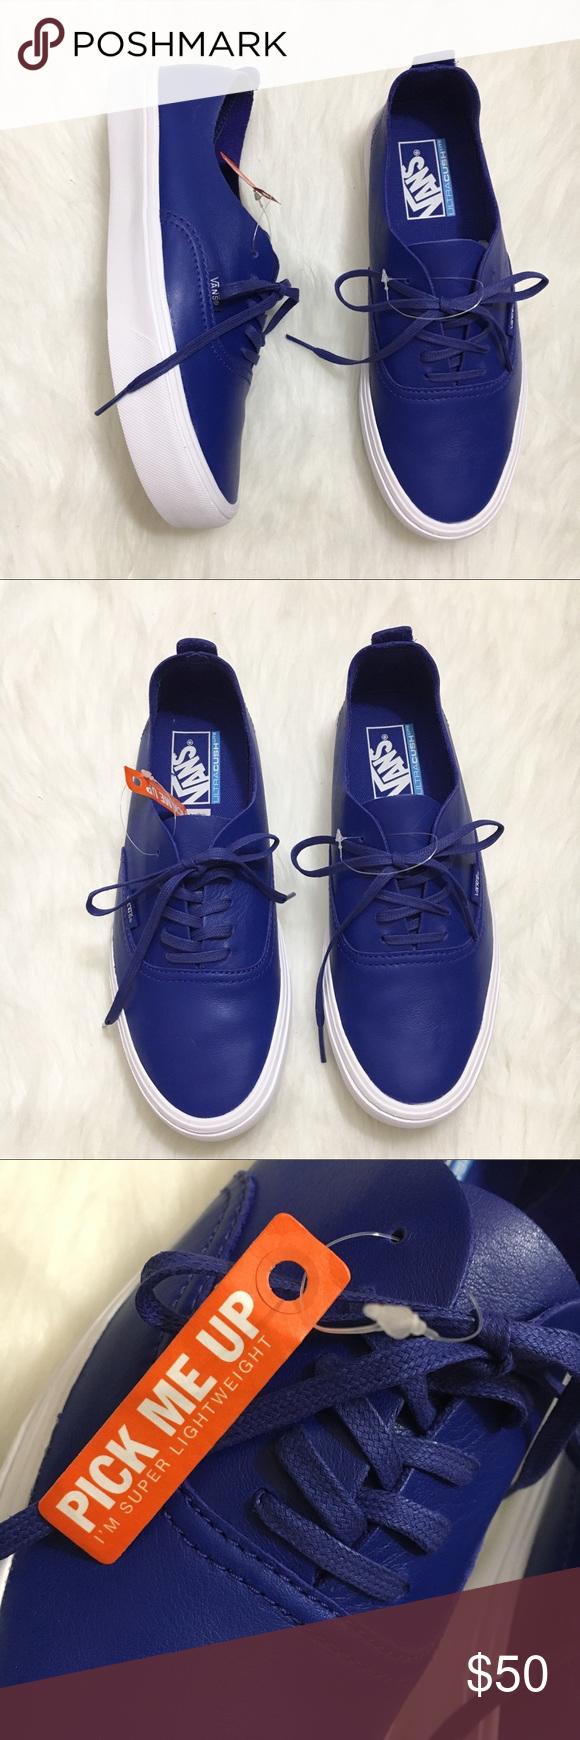 ed12f71030 Vans Ultracrush Lite Blue Sneakers Unisex NWT